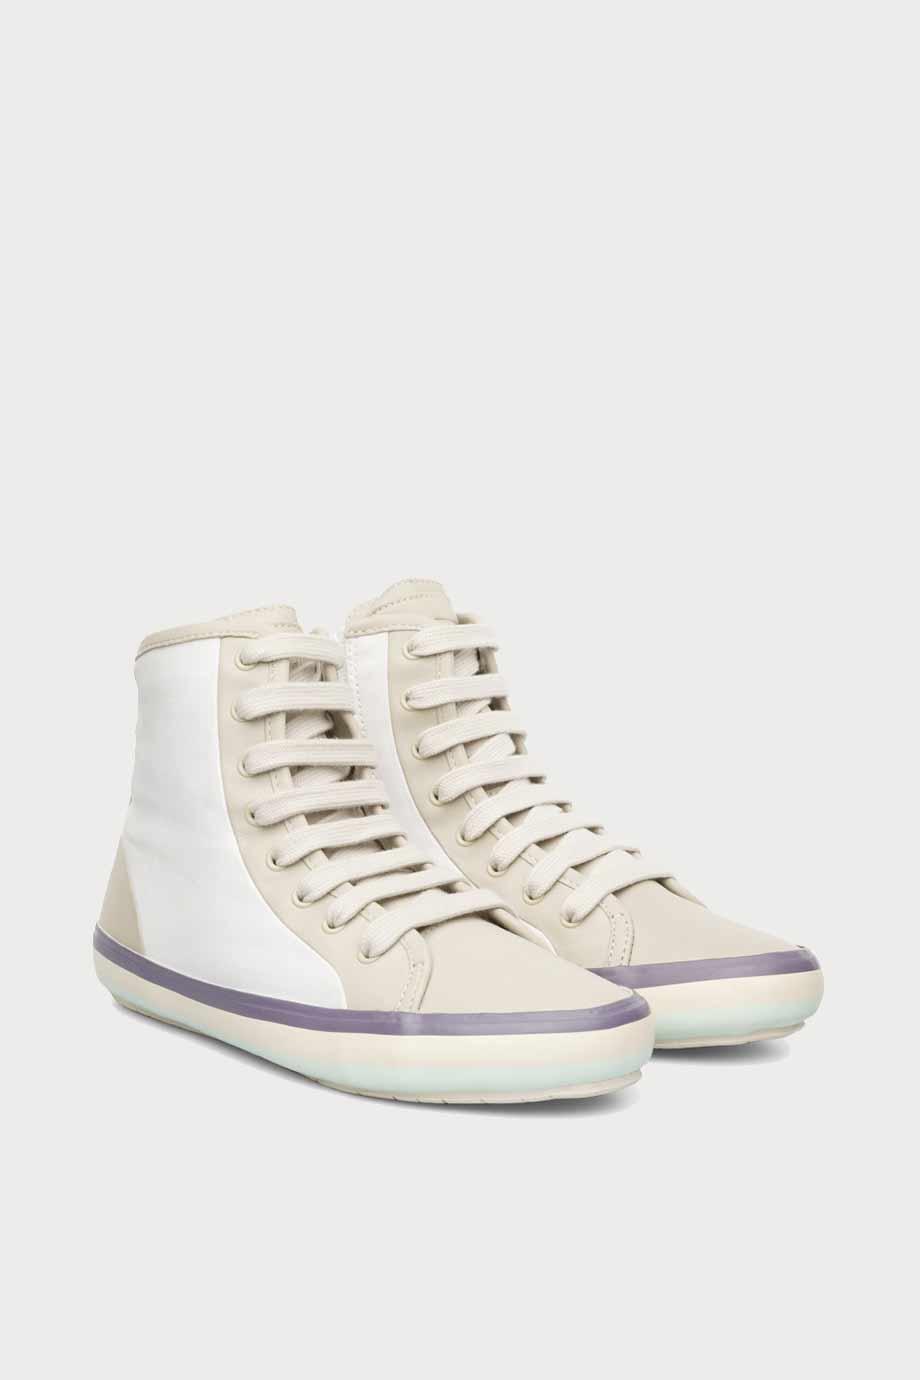 spiridoula metheniti shoes xalkida p .Camper 46706 005 Portoljpg 1